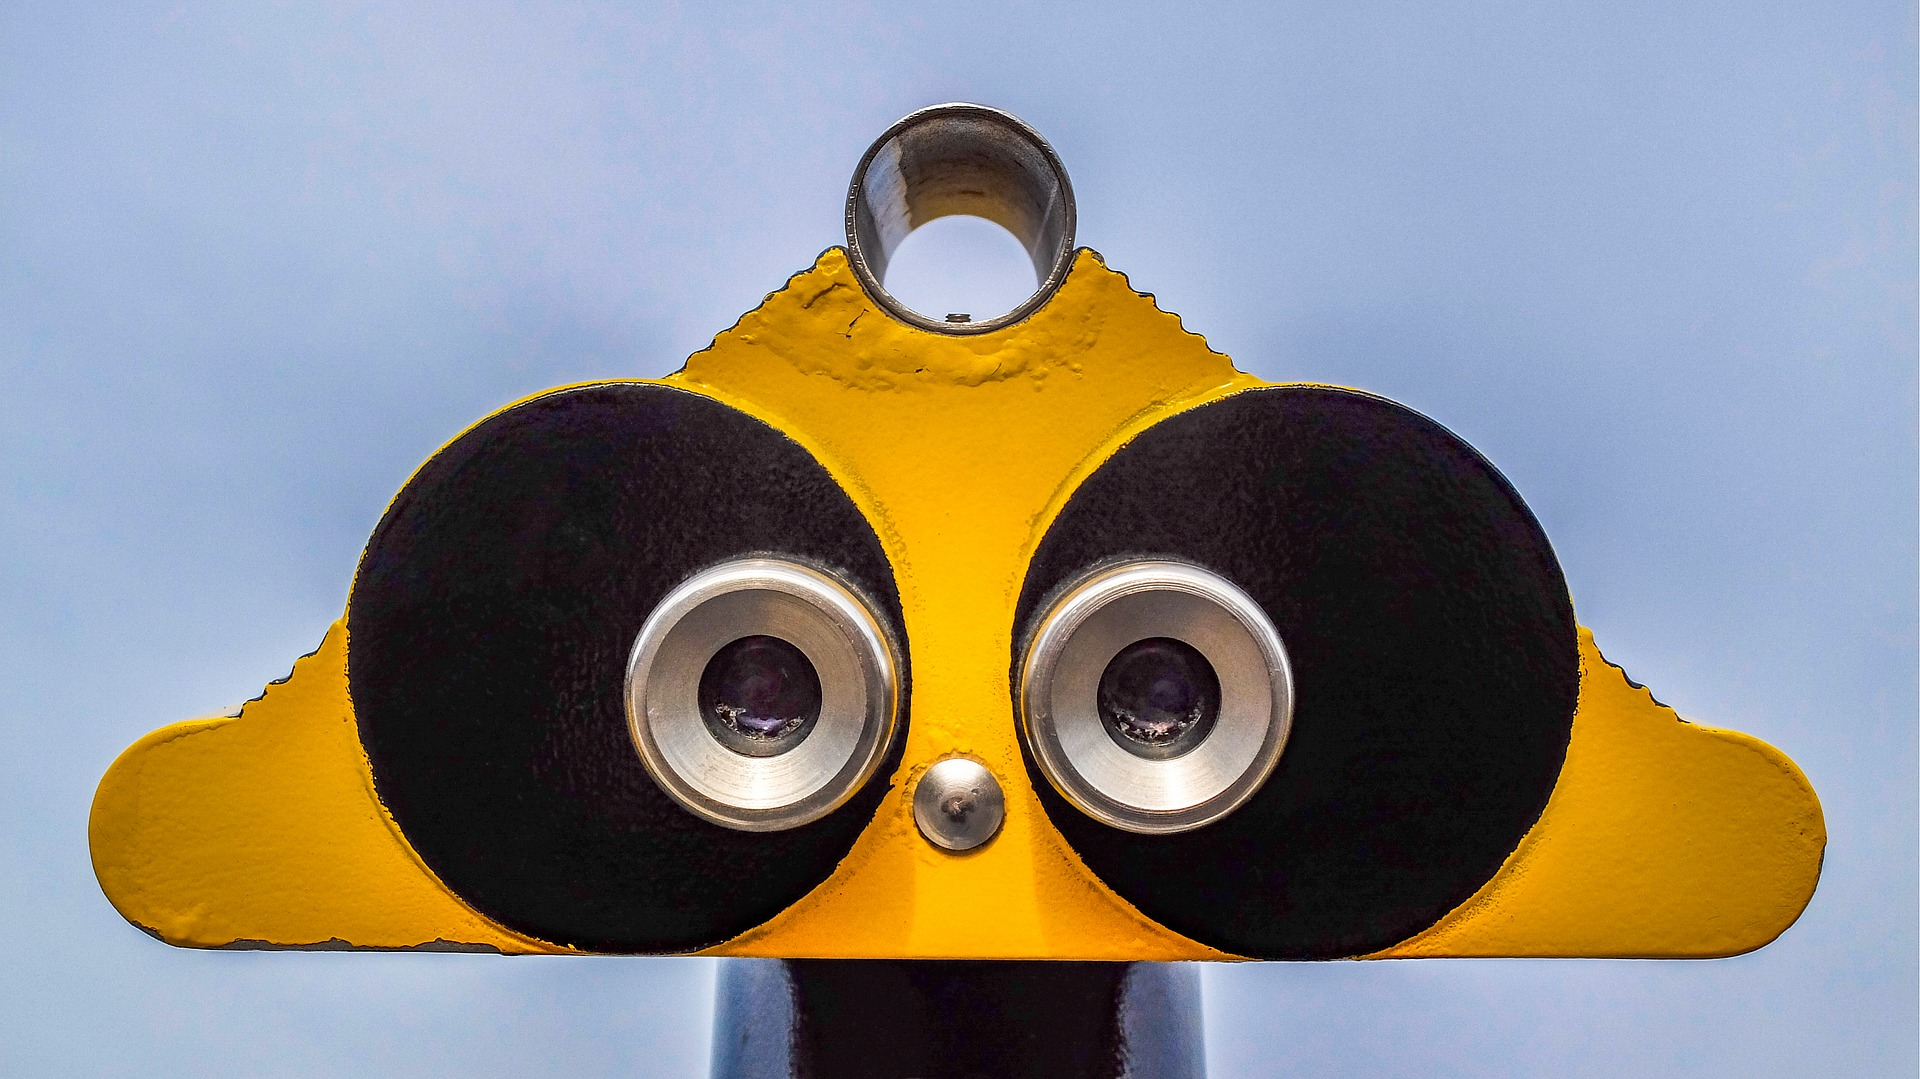 binocular-1966316_1920.jpg